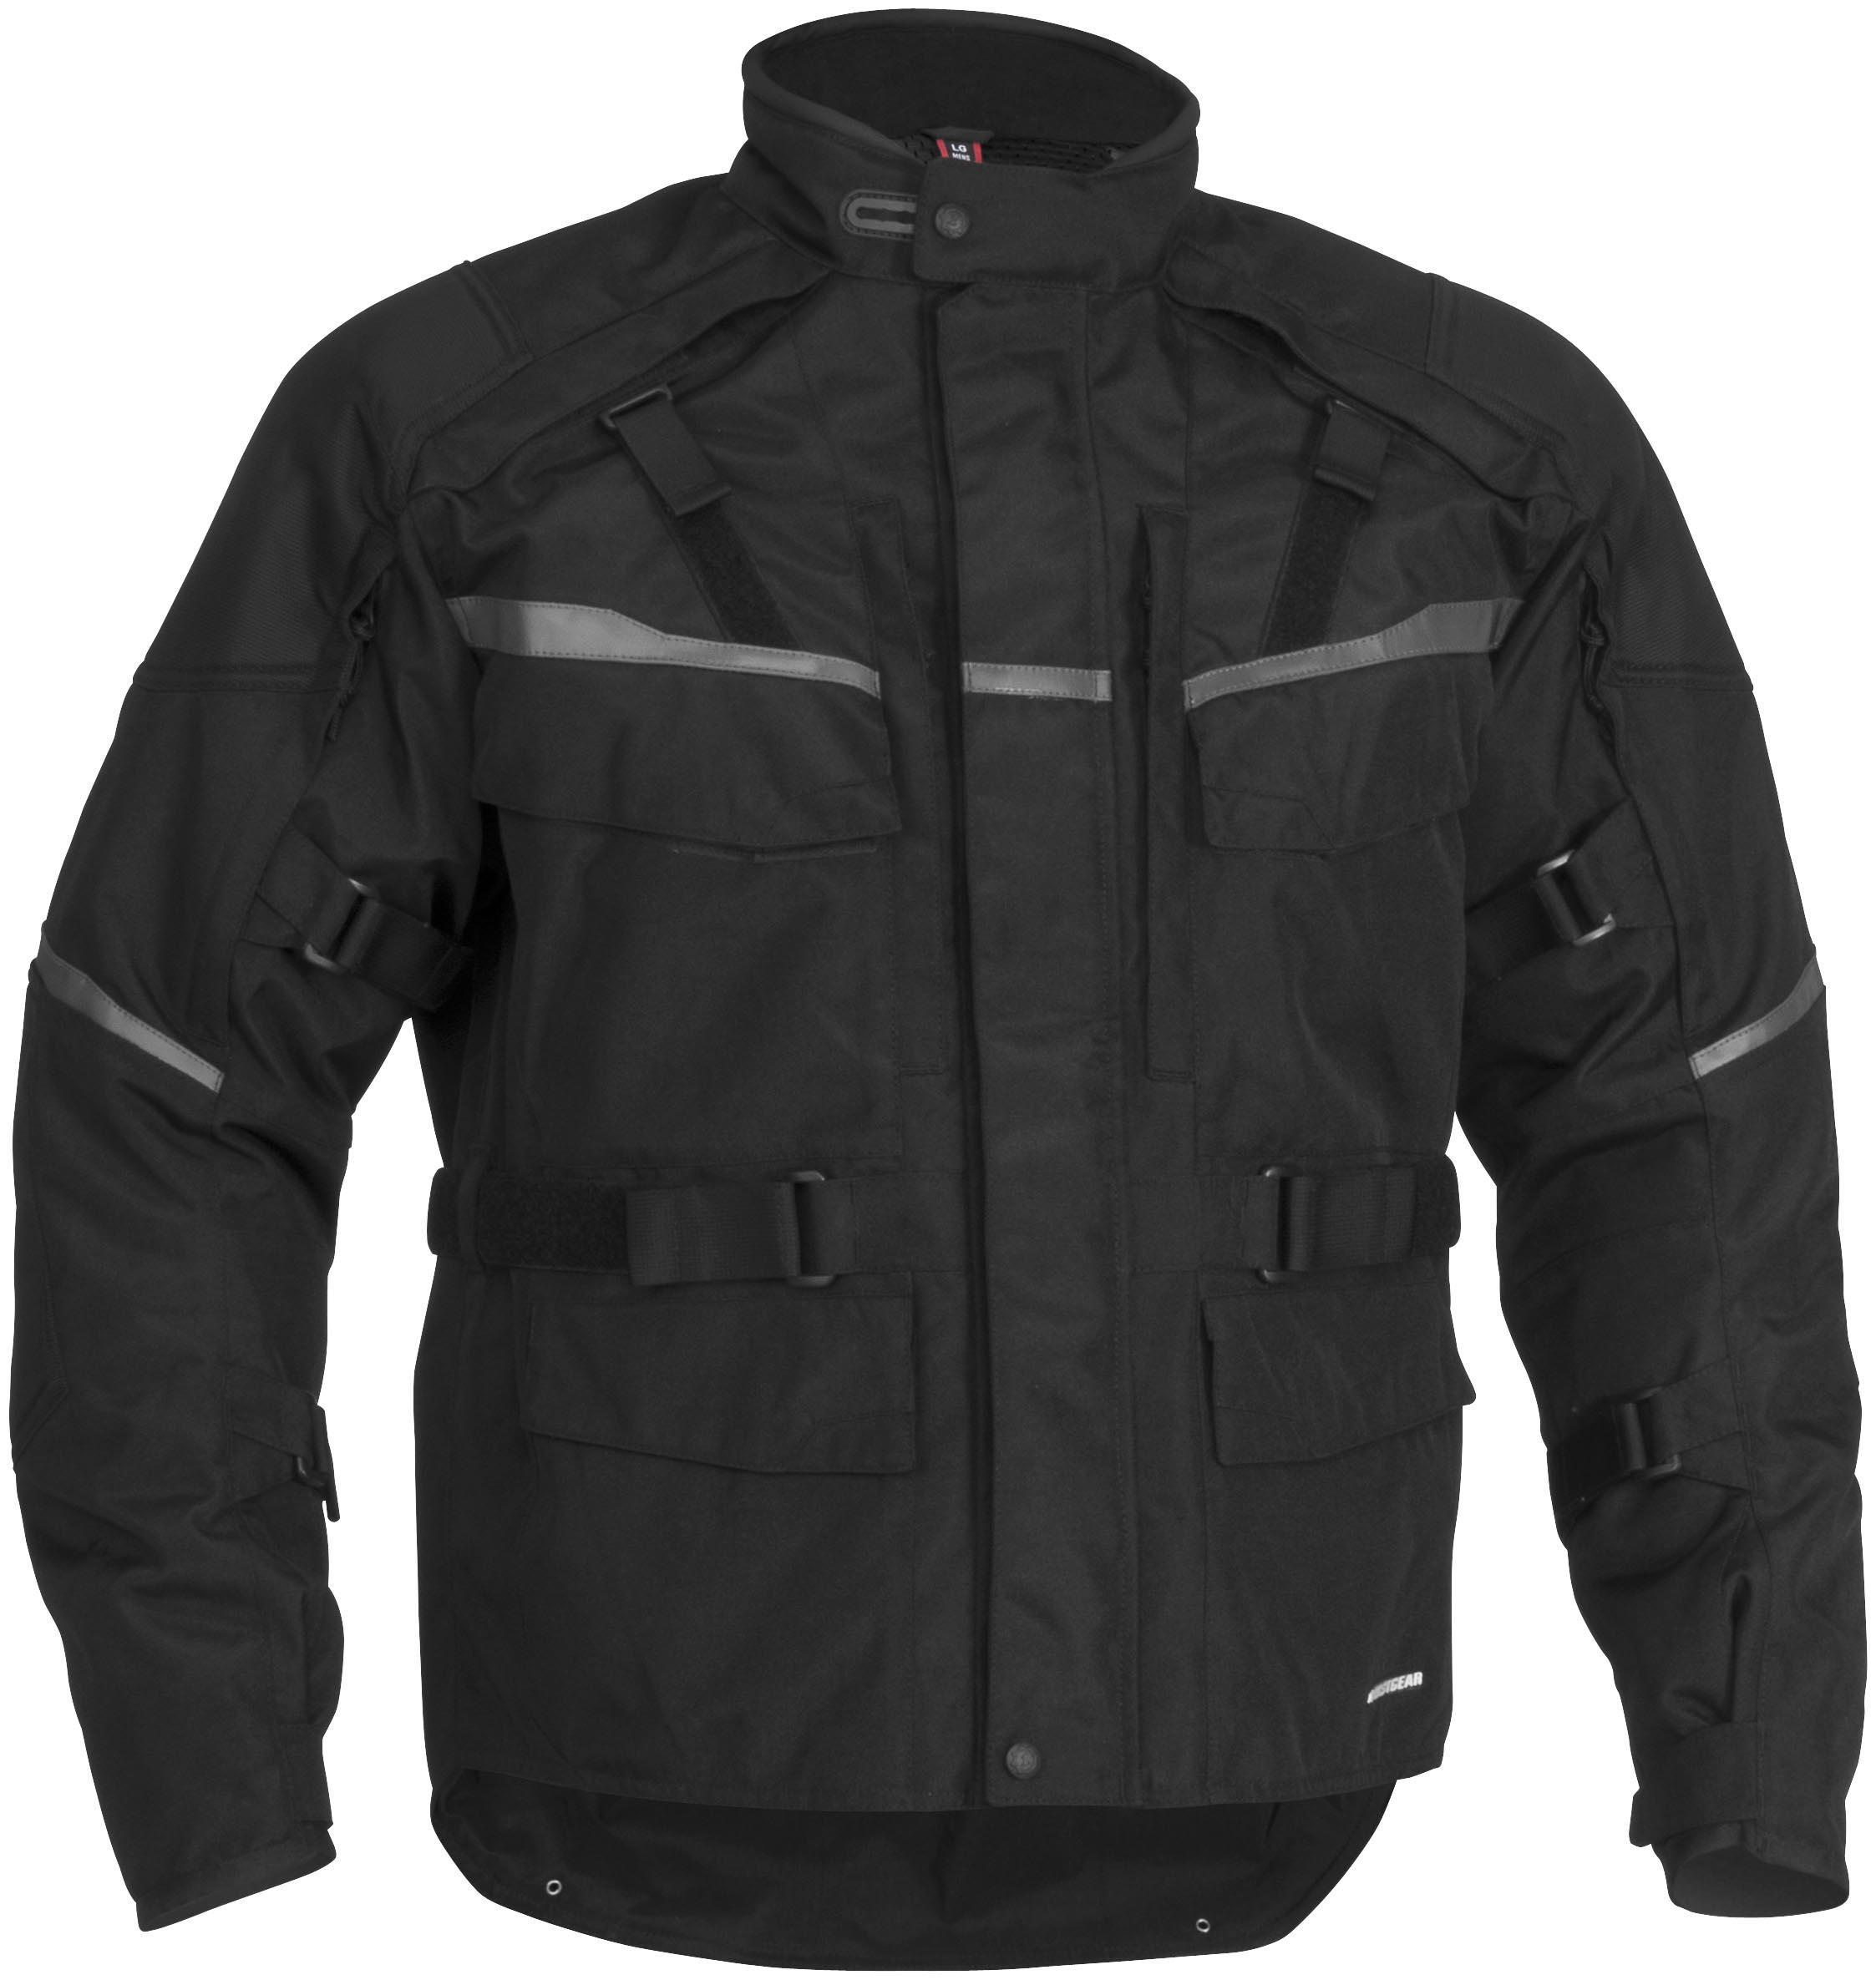 Firstgear 14' Jaunt 12 Jacket